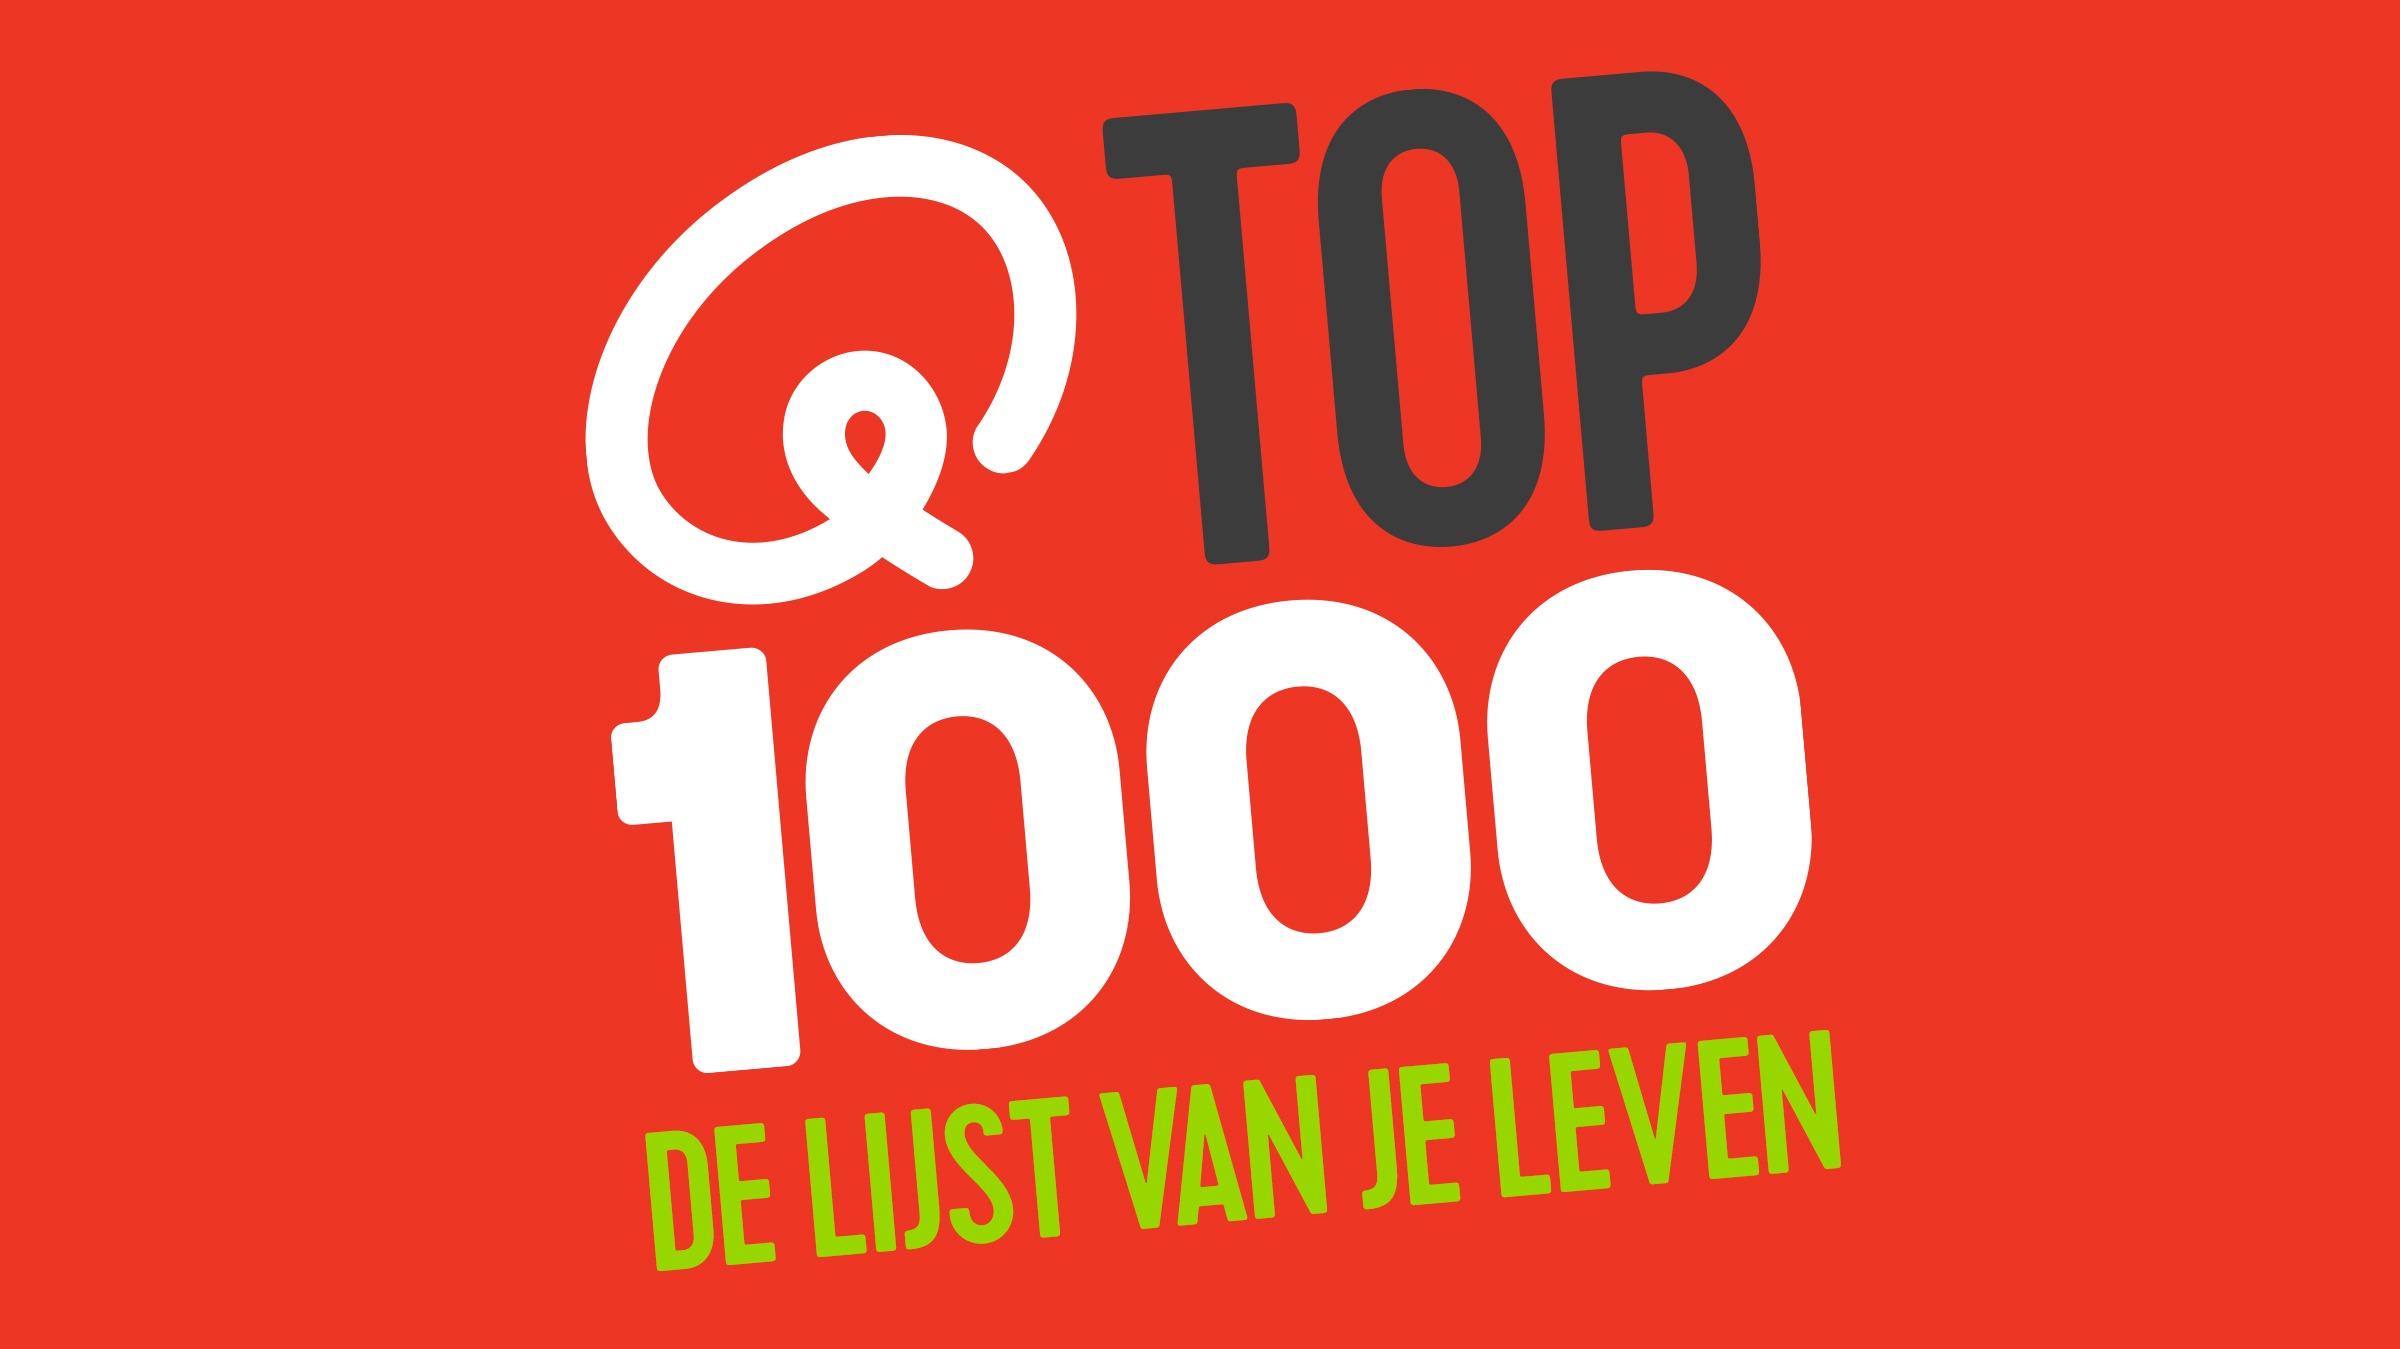 Qmusic teaser qtop1000